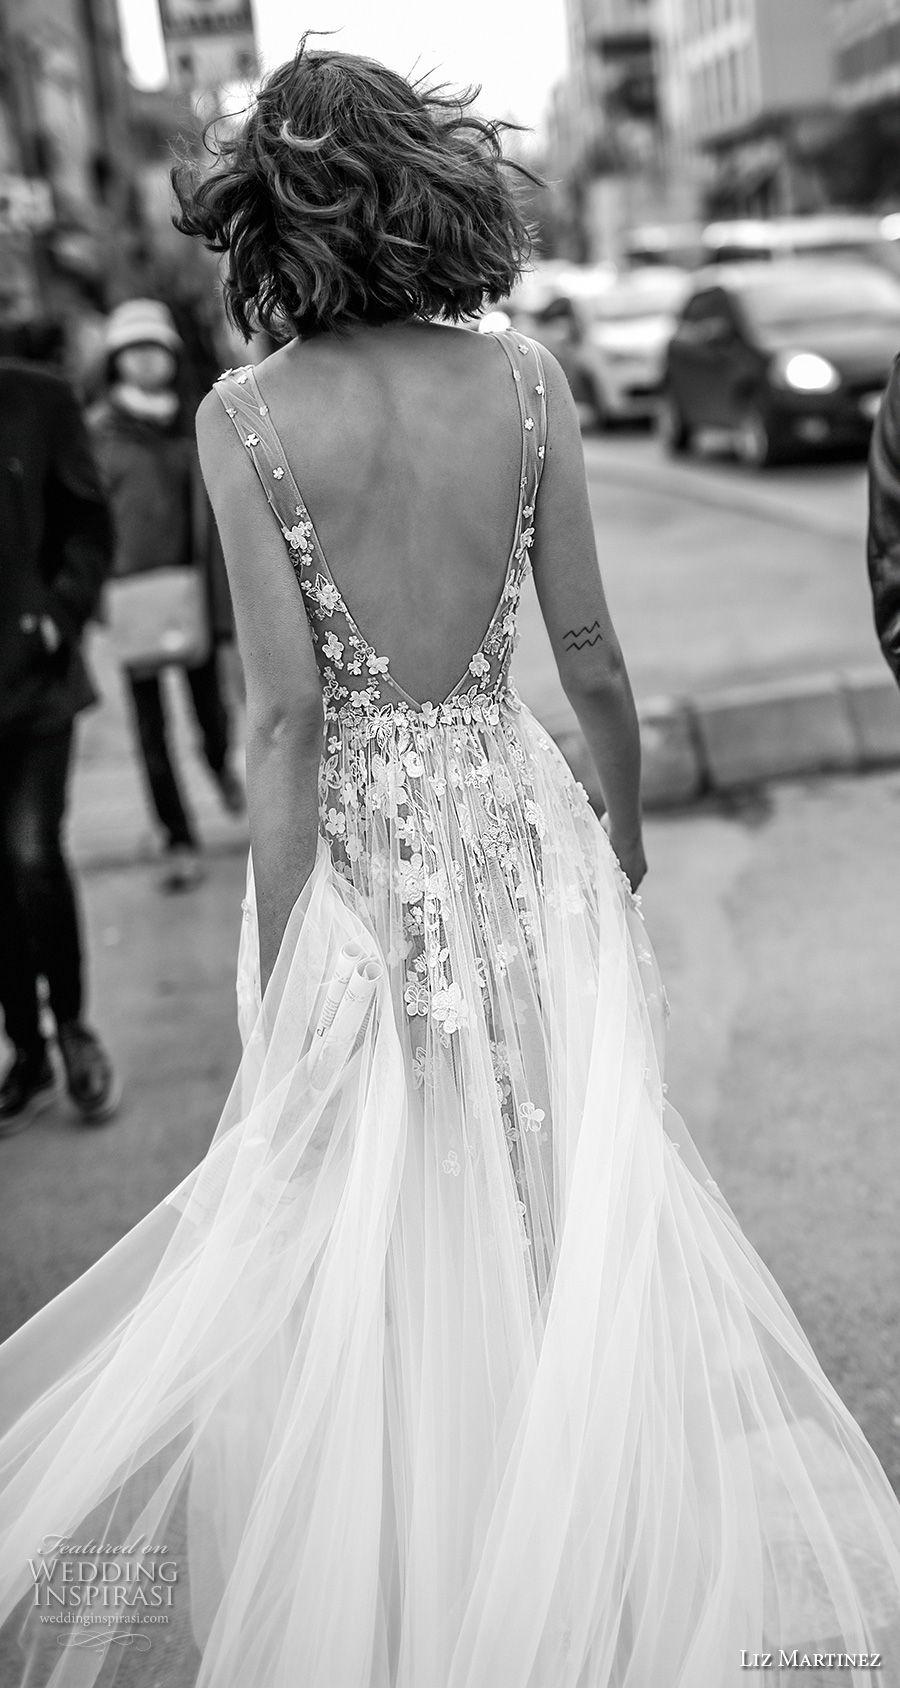 liz martinez 2019 bridal sleeveless deep v neck heavily embellished bodice tulle skirt romantic soft a  line wedding dress open scoop back chapel train (1) zbv